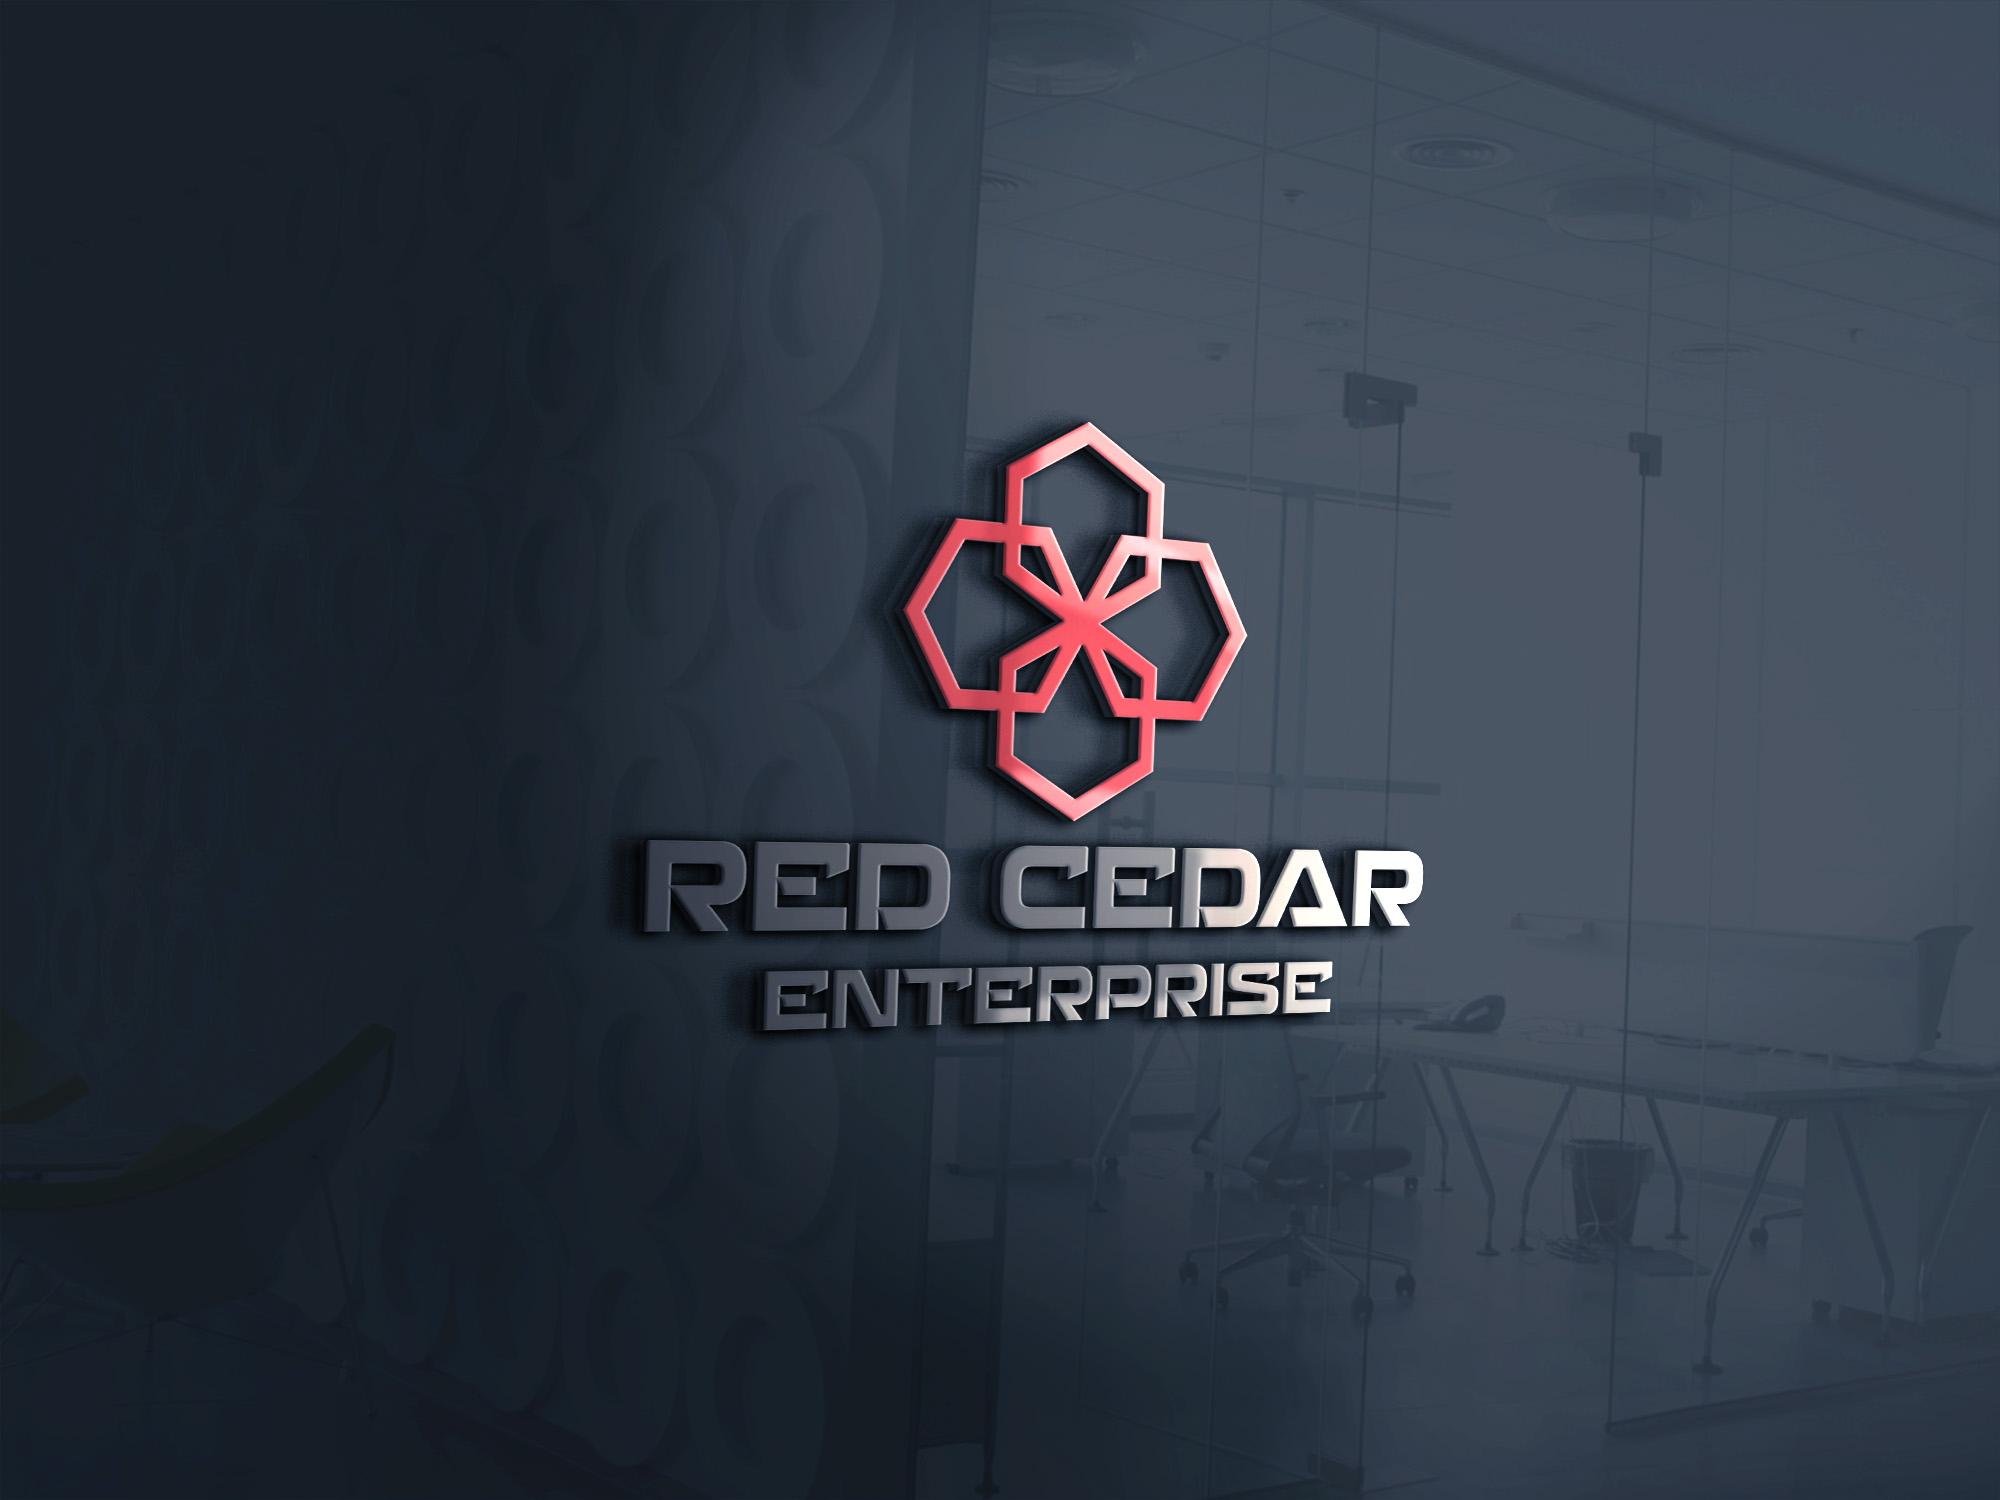 Logo Design by Umair ahmed Iqbal - Entry No. 44 in the Logo Design Contest Unique Logo Design Wanted for Red Cedar Enterprise.